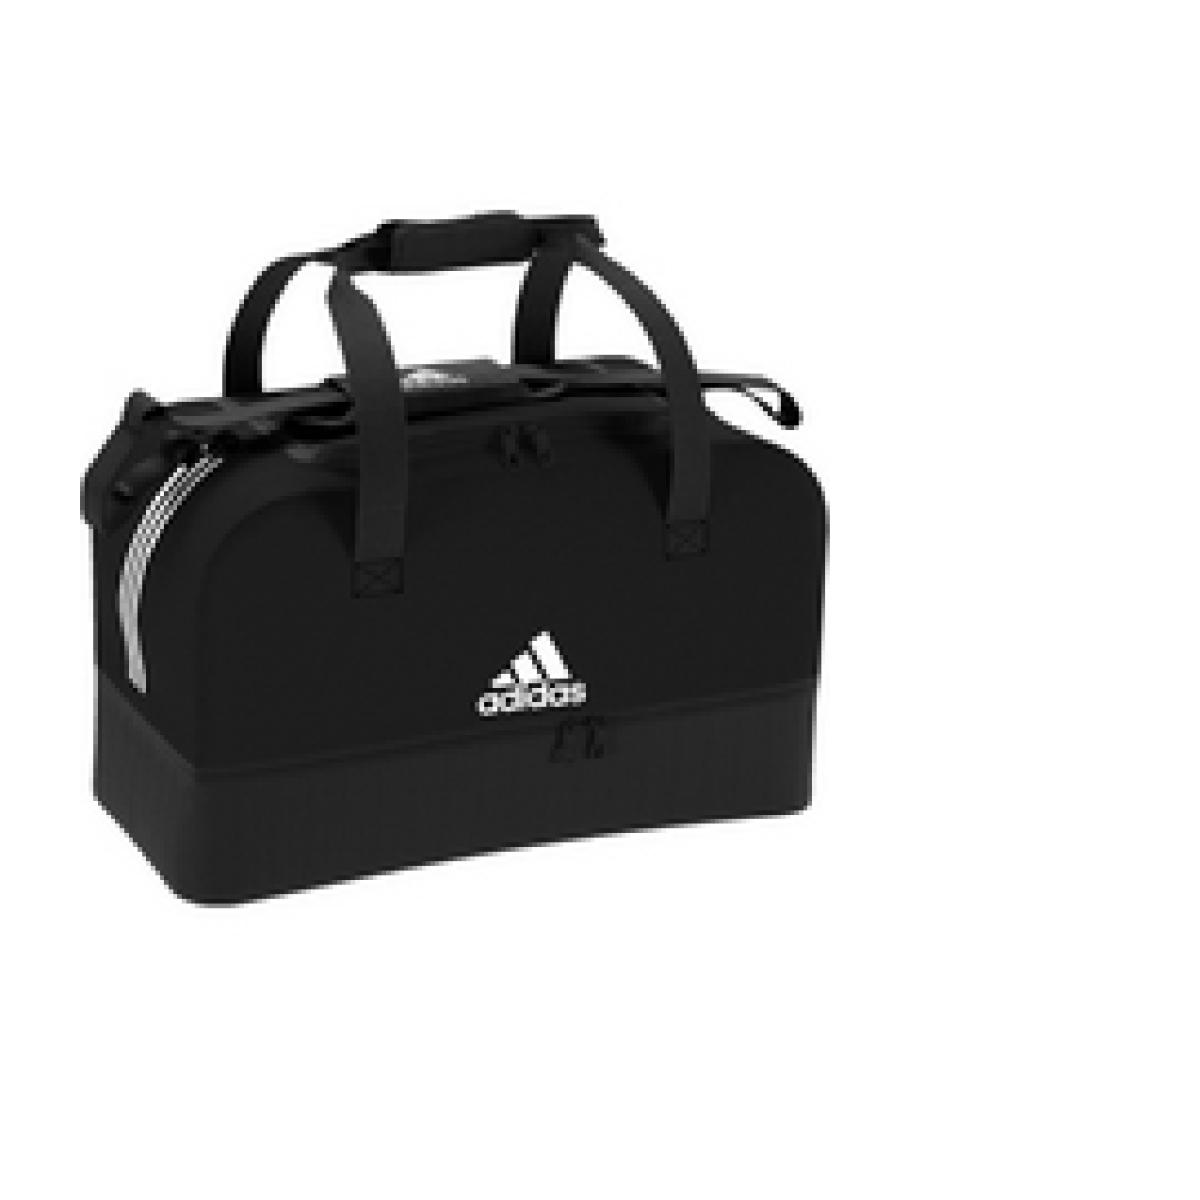 Bolsa Unisex Adidas Dq1081 Mala Tiro l Preto/branco